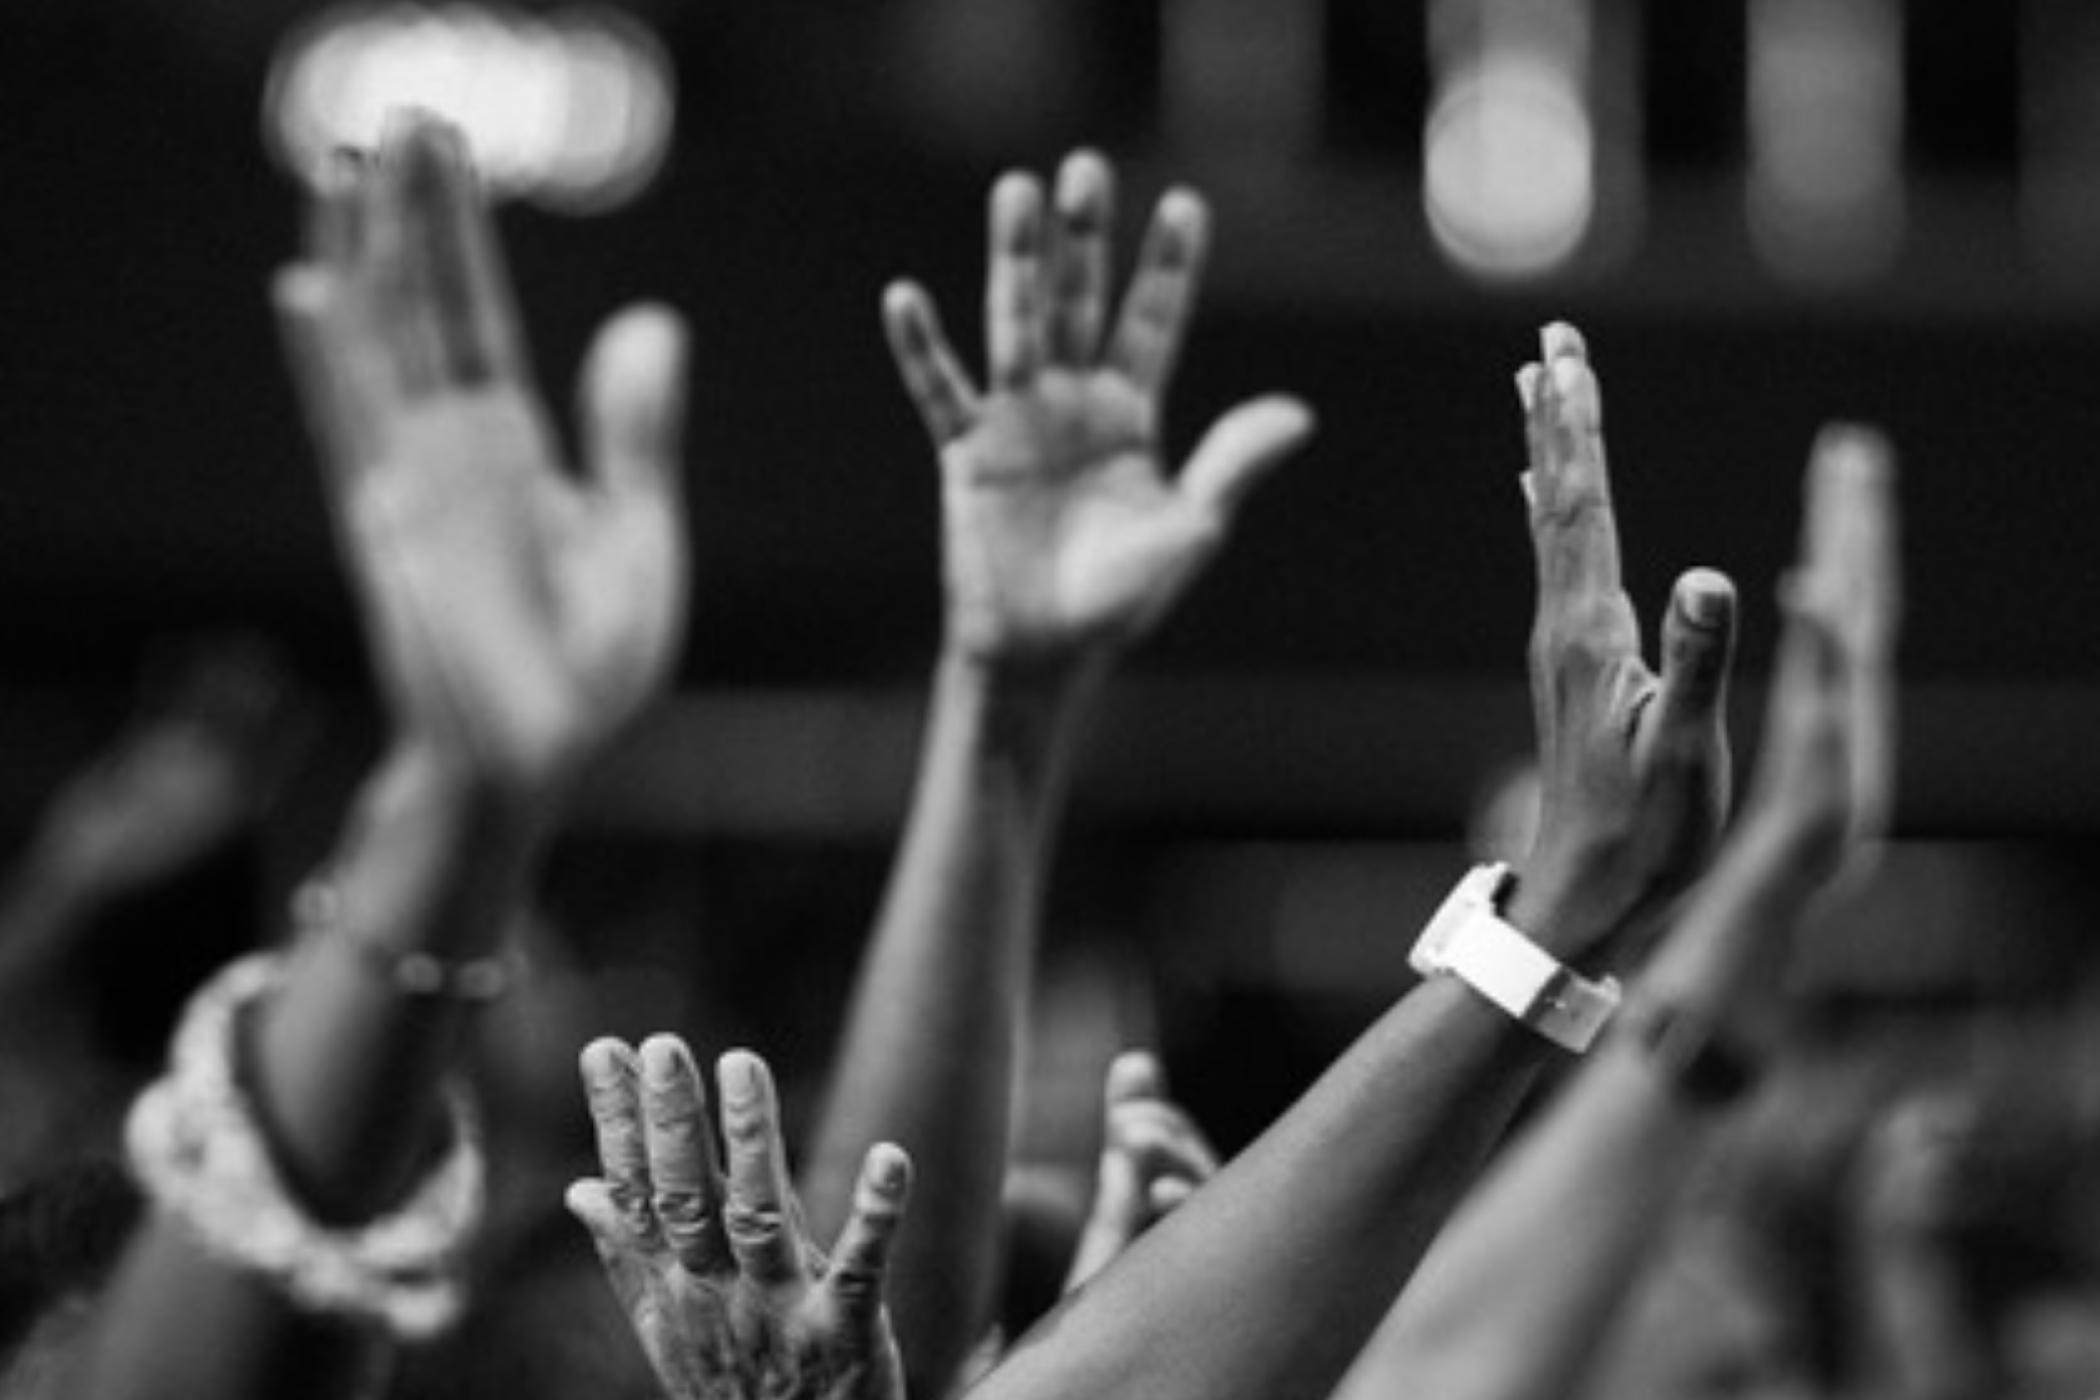 raised voting hands